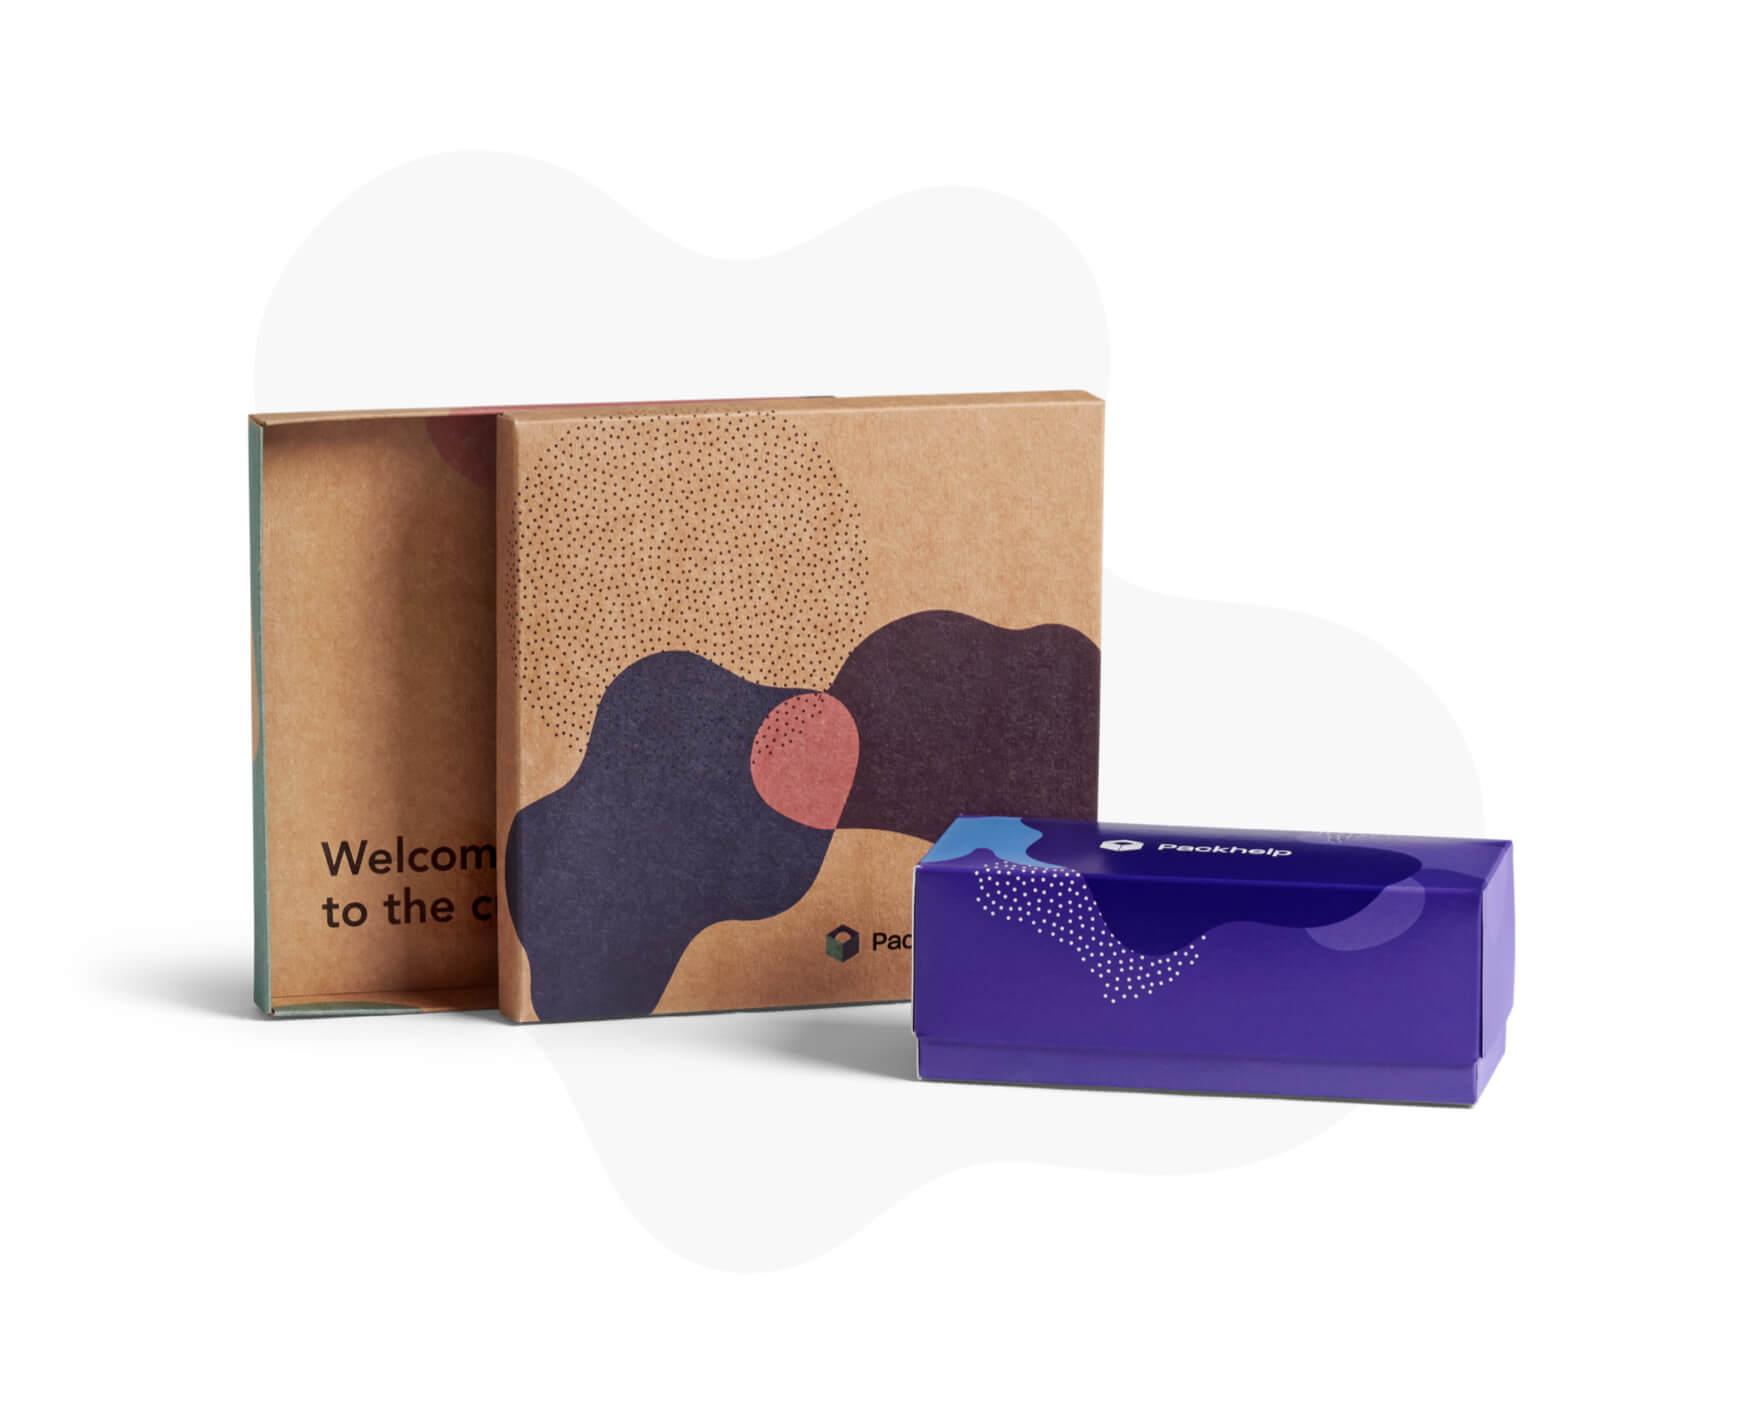 e6061f3e7fb8 Caja para productos de dos piezas con impresión interna y externa ...